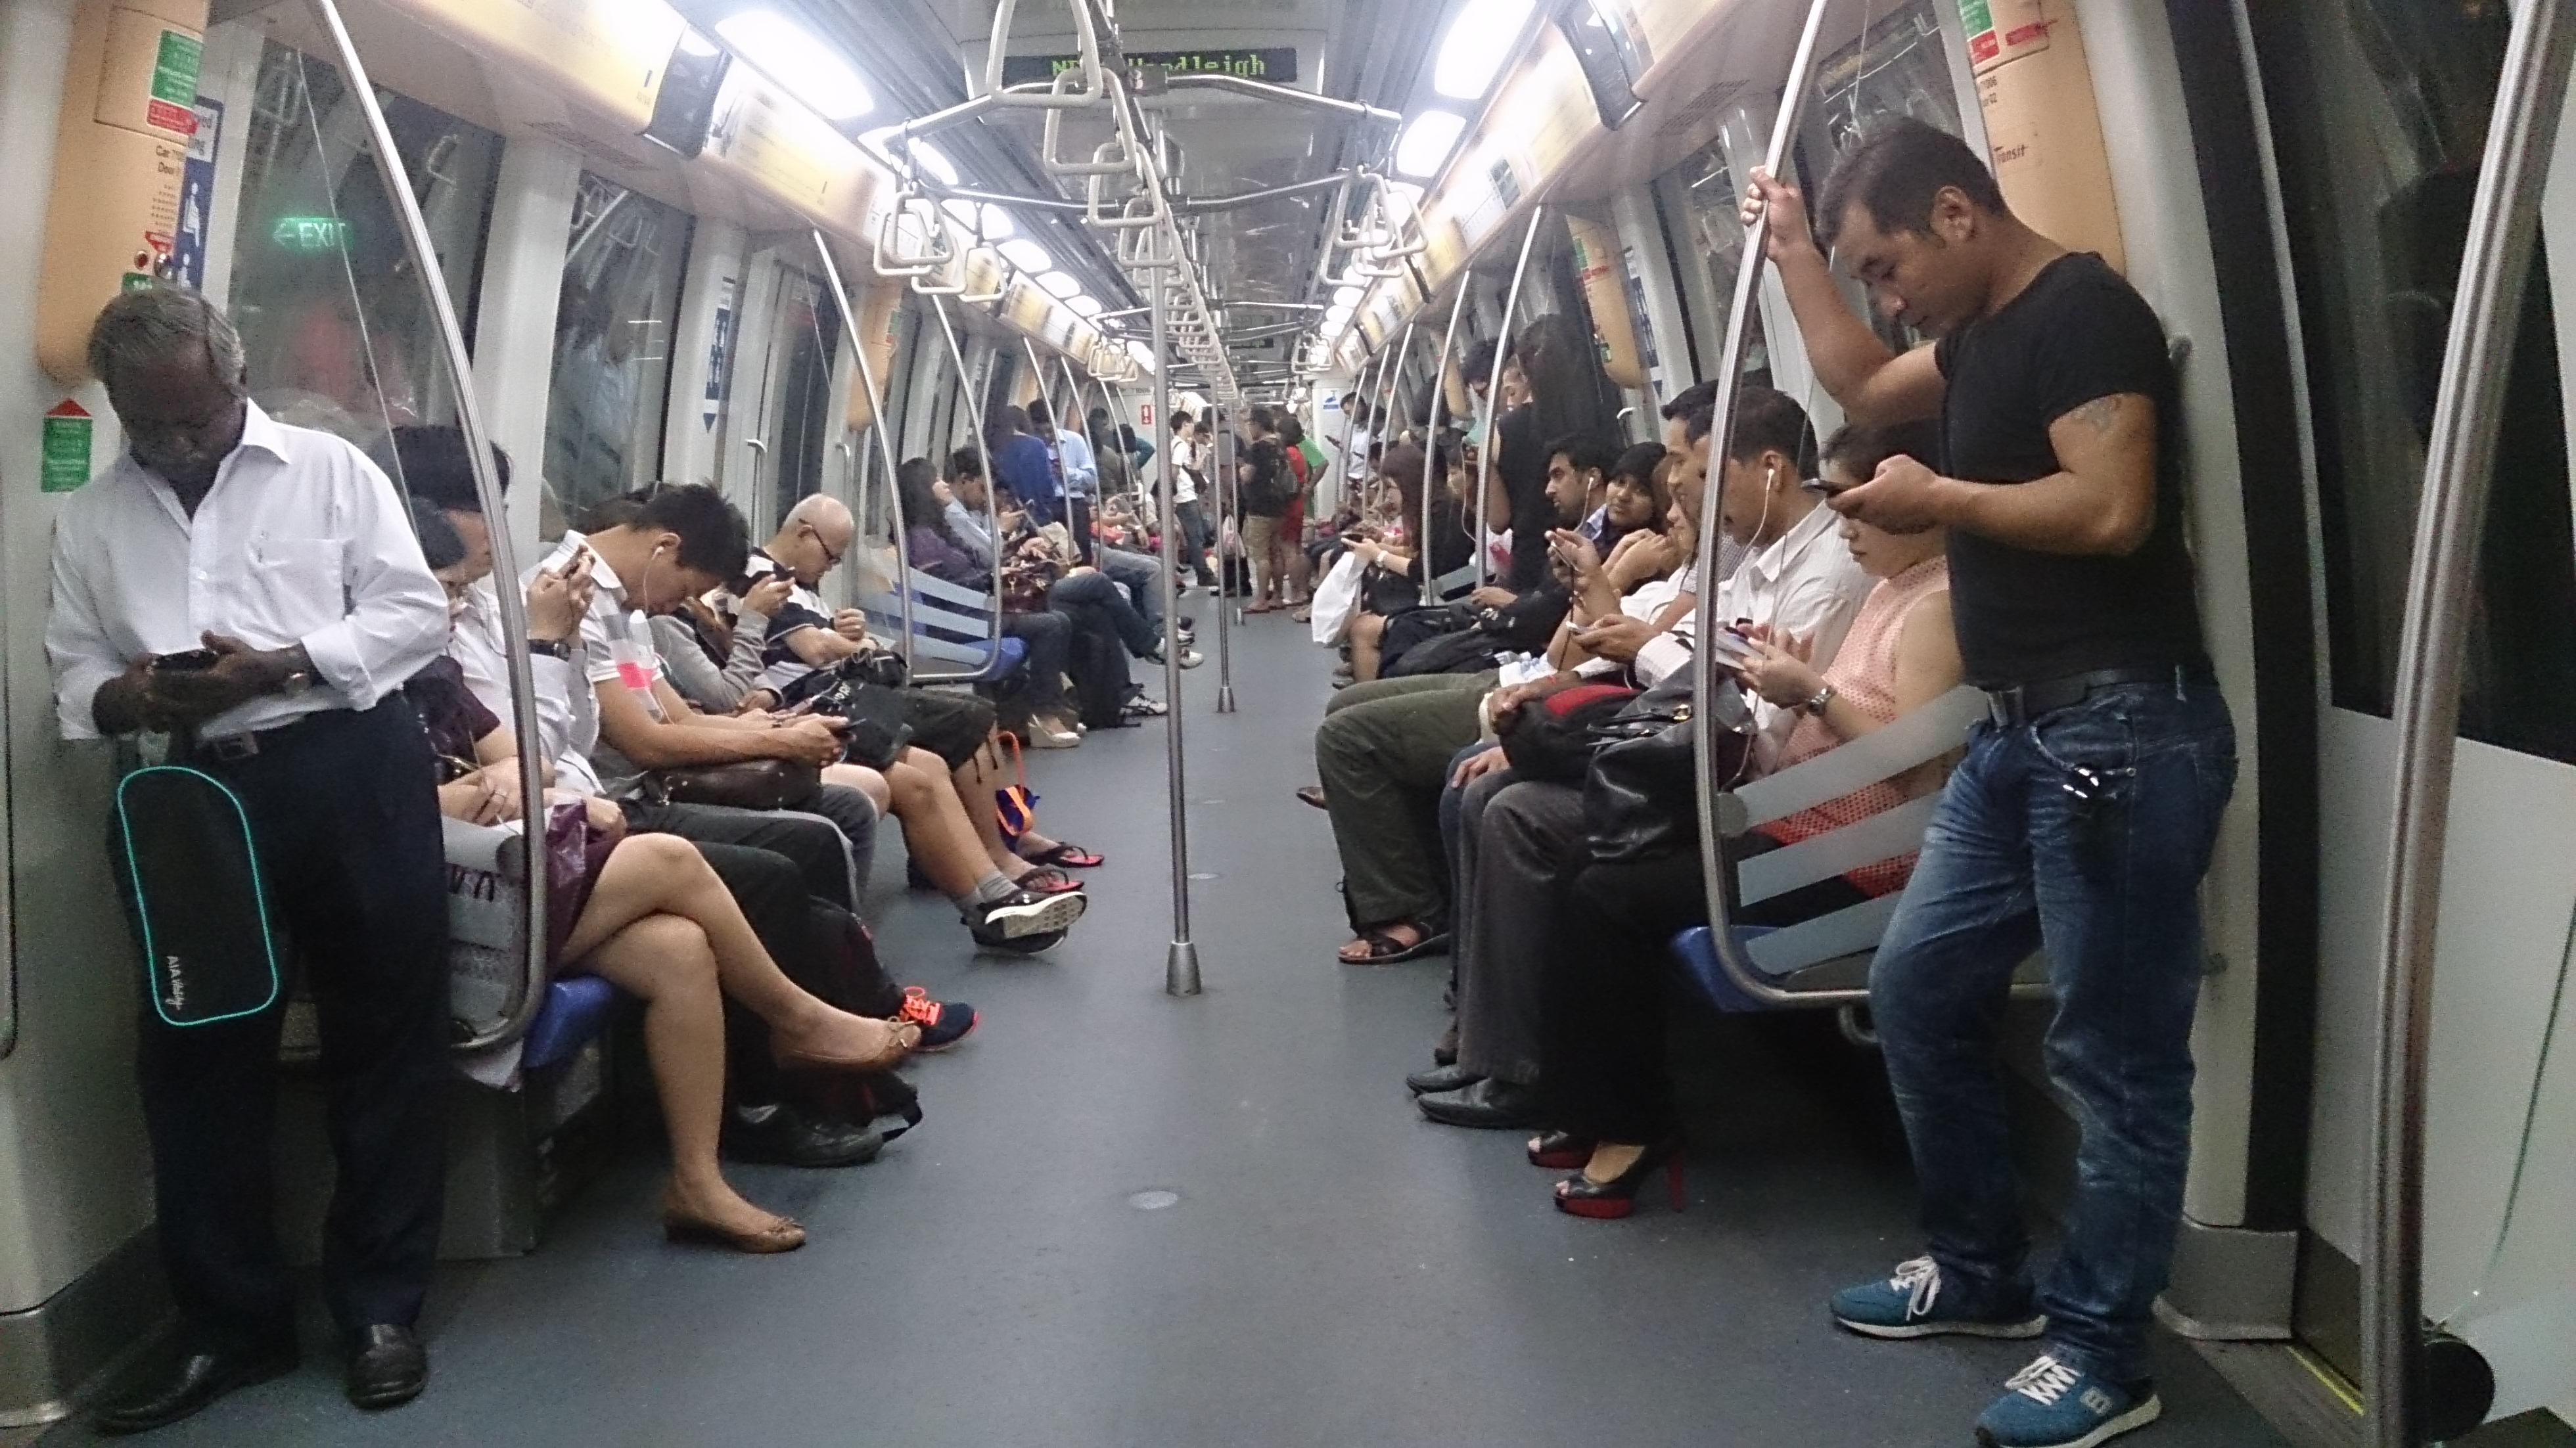 File Inside The Mrt Train Singapore Jpg Wikimedia Commons